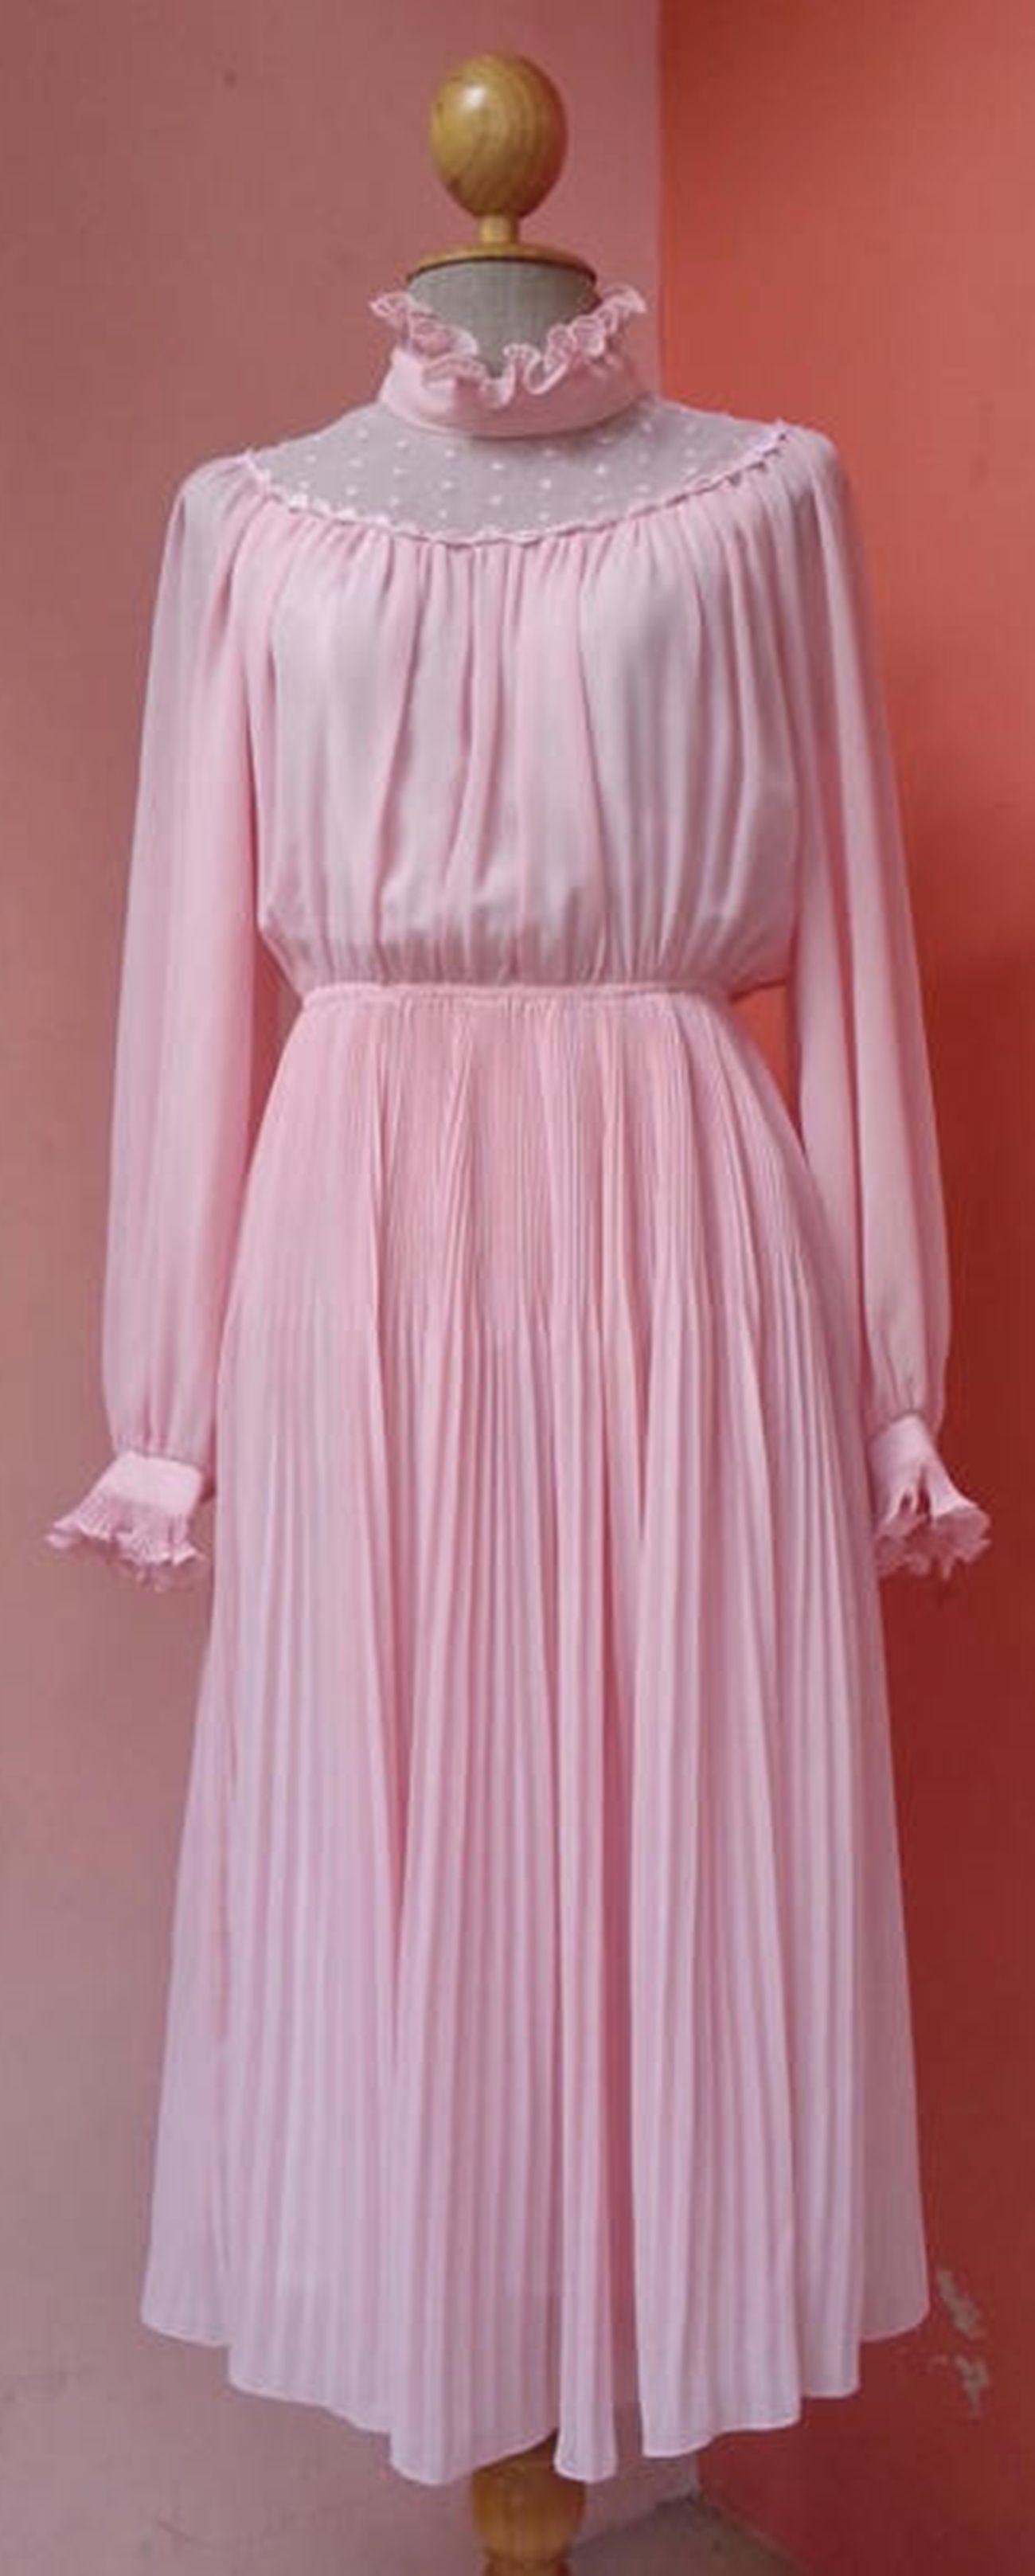 80s Dress Prom Dress Party Dress Evening Gown Dress Cocktail Dress ...